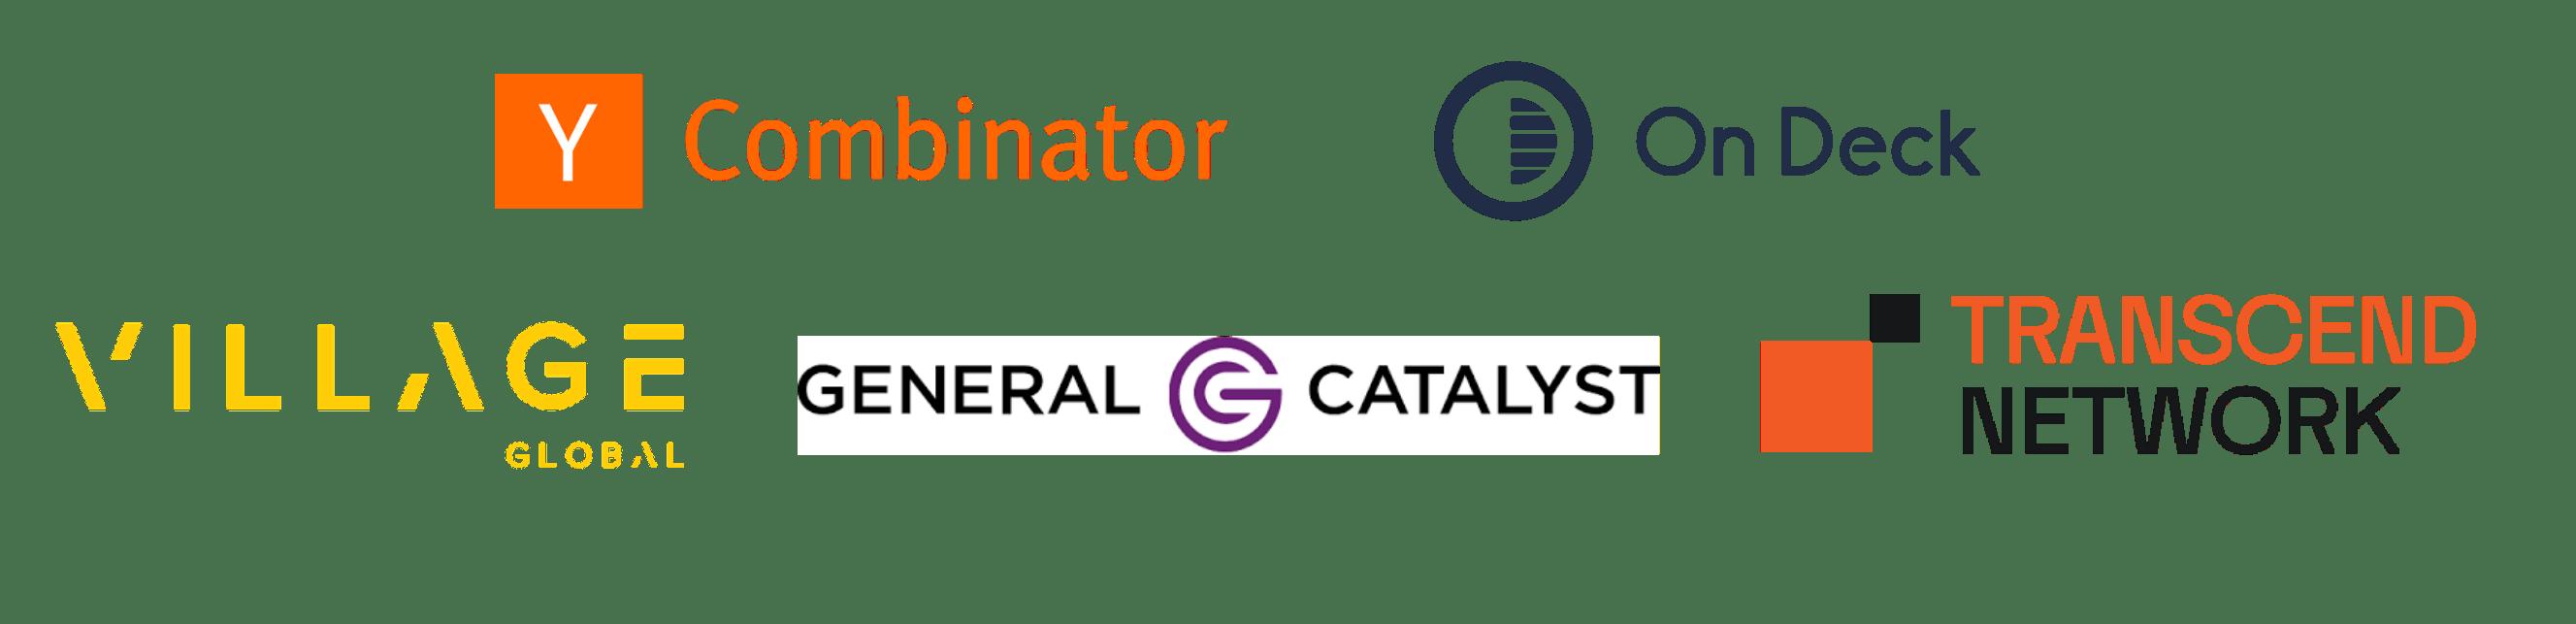 investors of companies